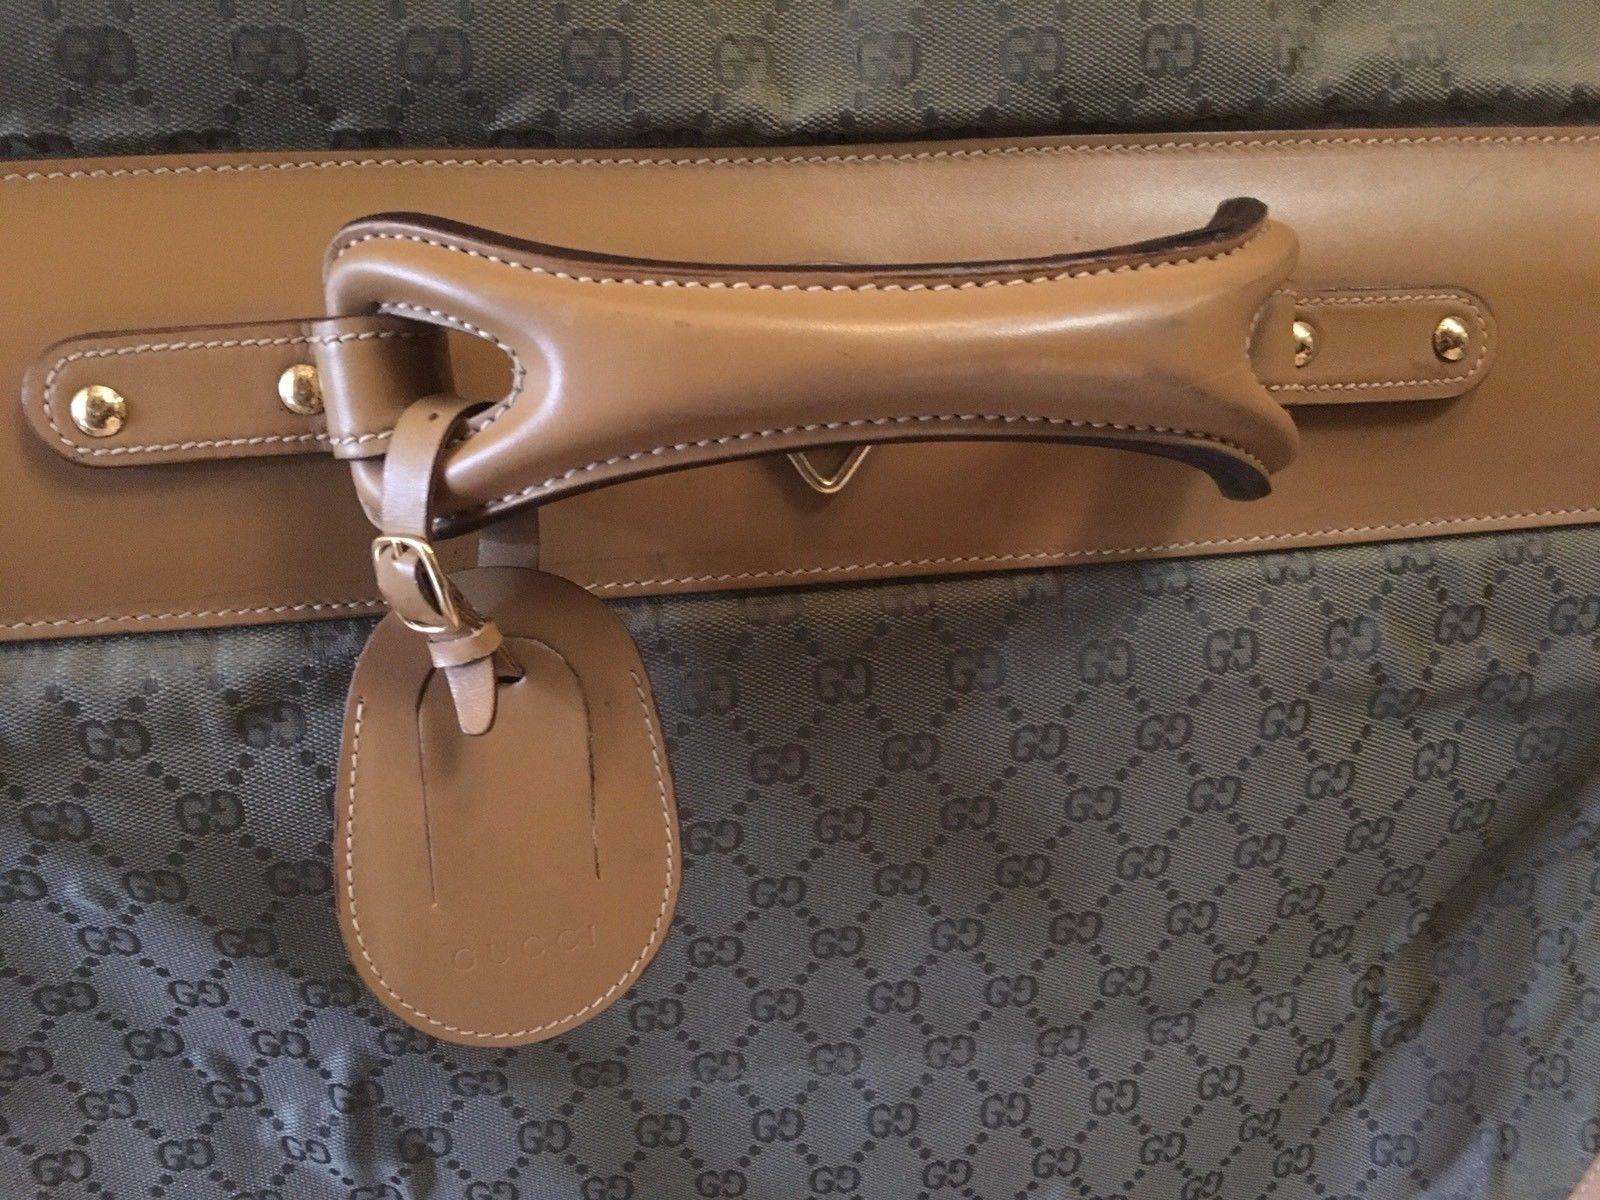 a3eab27eb Authentic Gucci Garment Bag Signature GG Monogram Canvas Brown Leather New  Strap | eBay